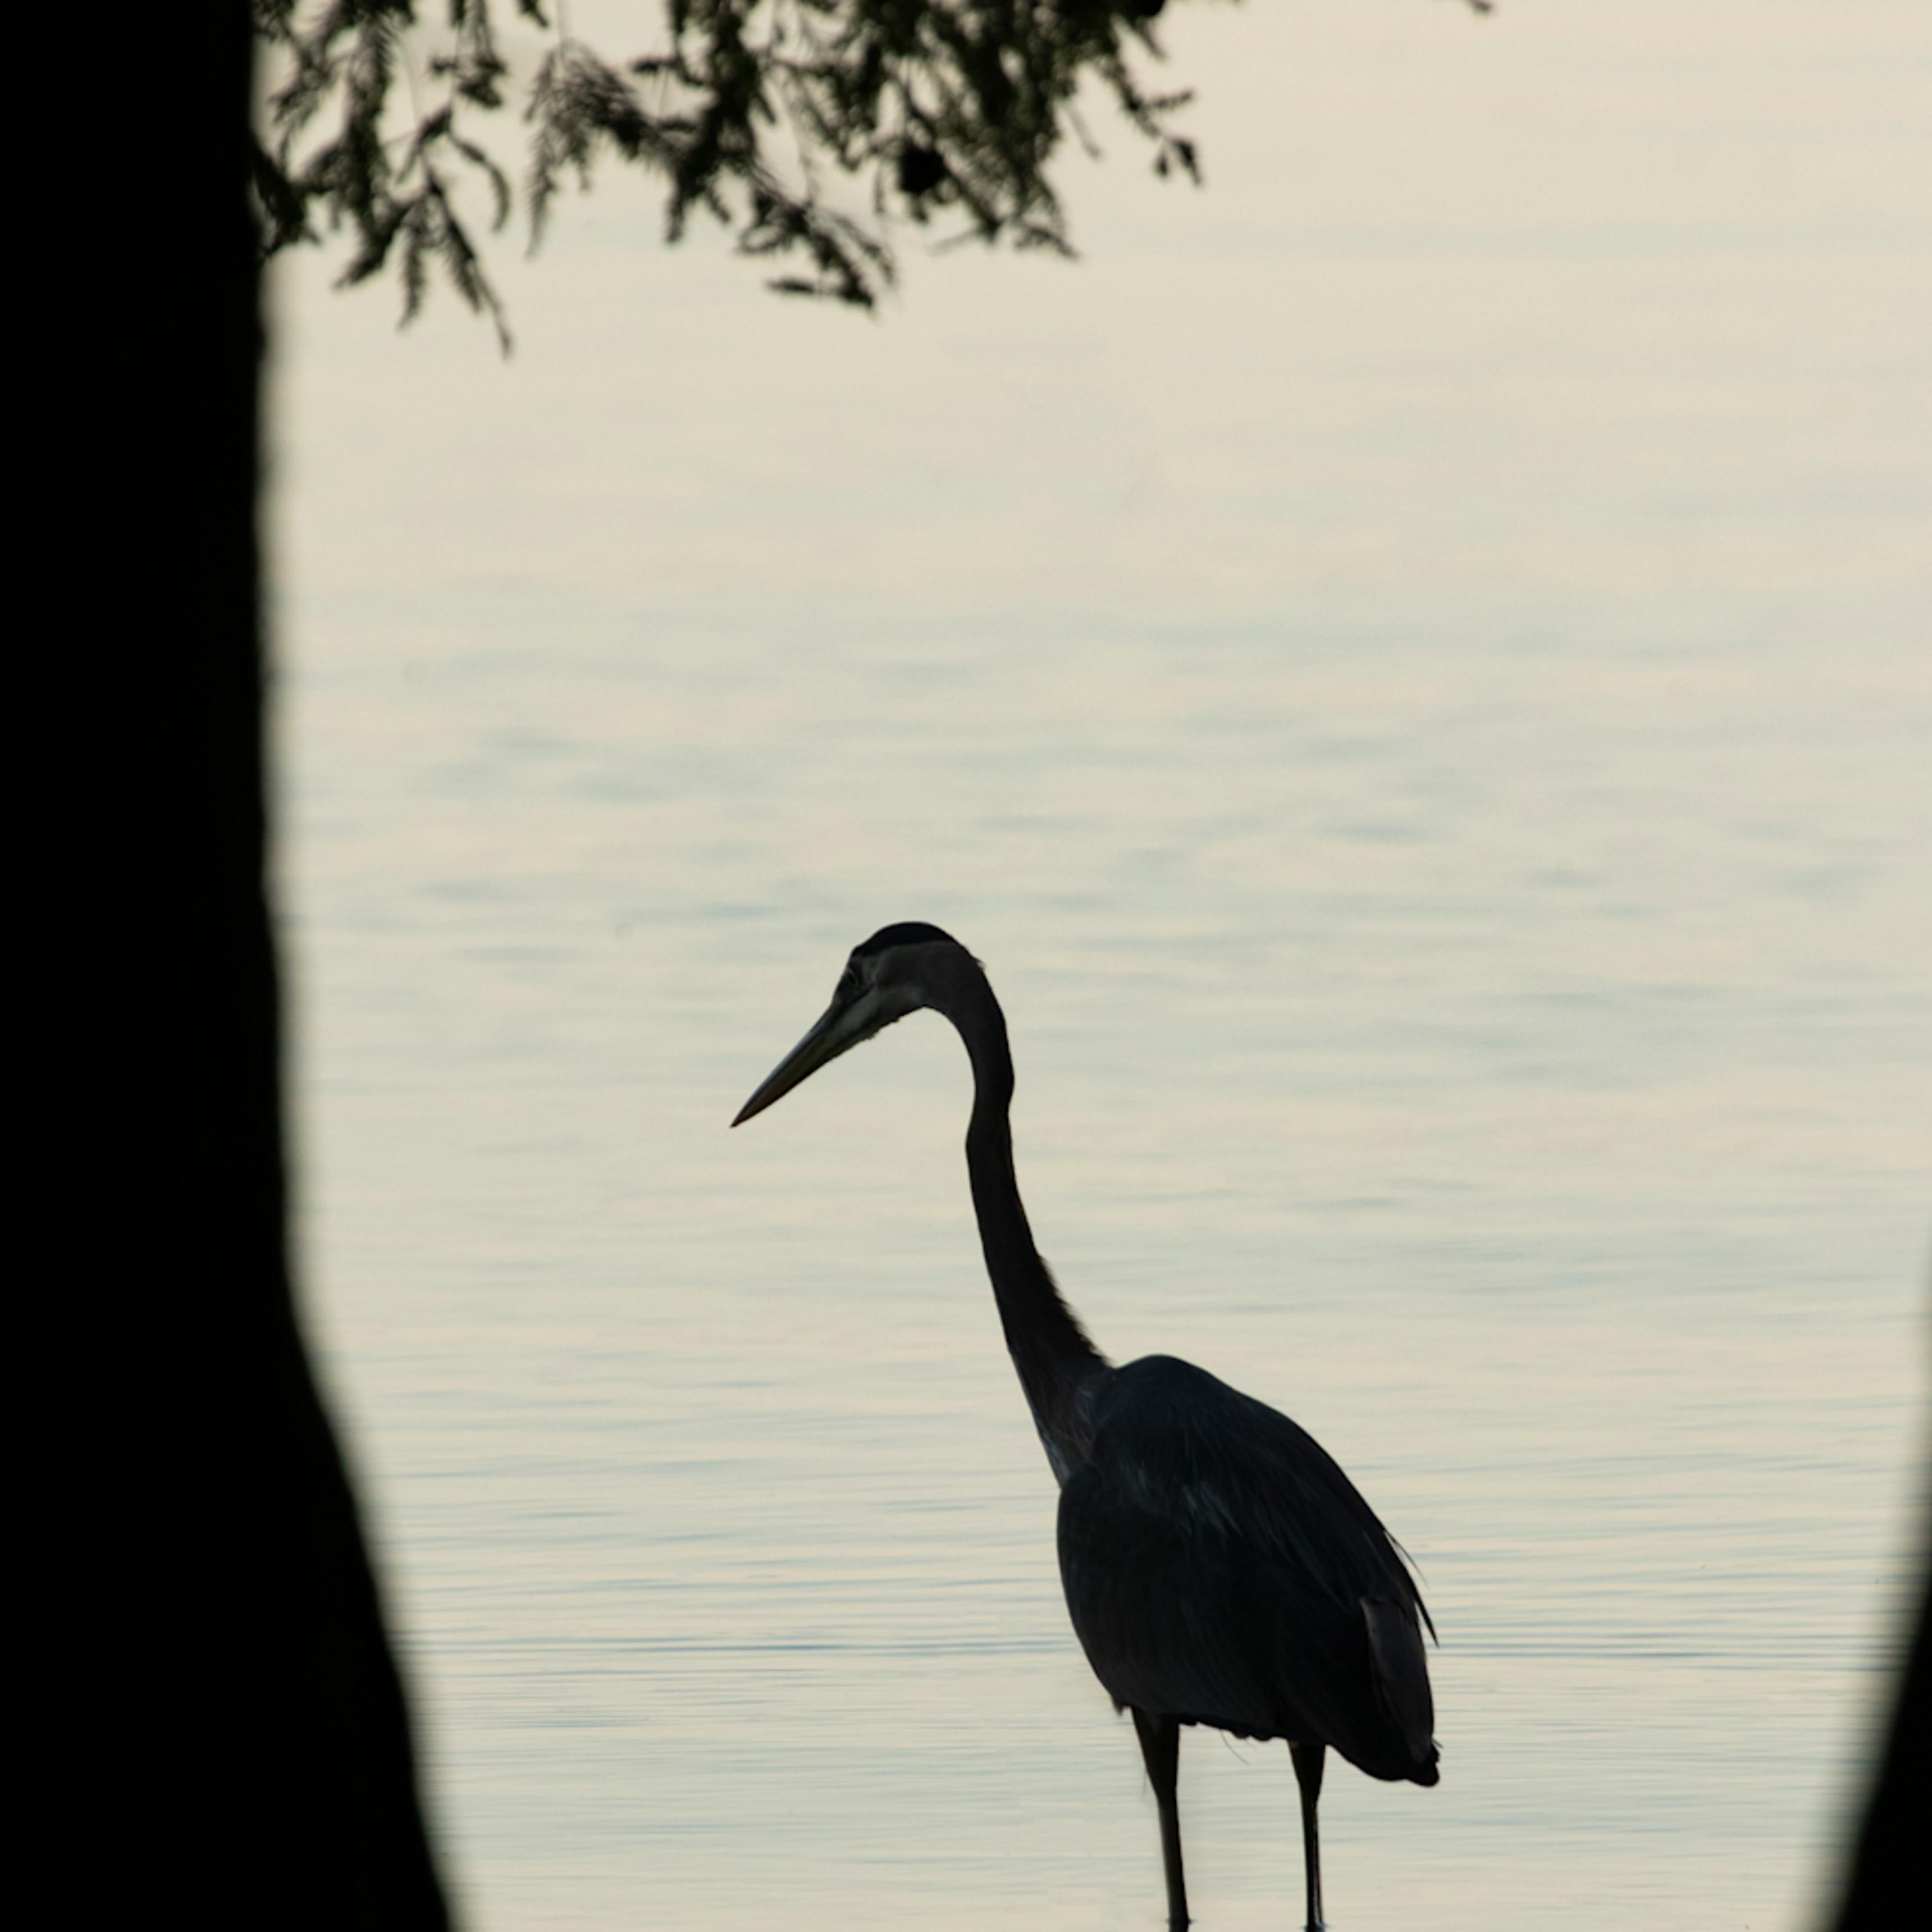 Heron silhouettes mg 7532 srm20 gfryde